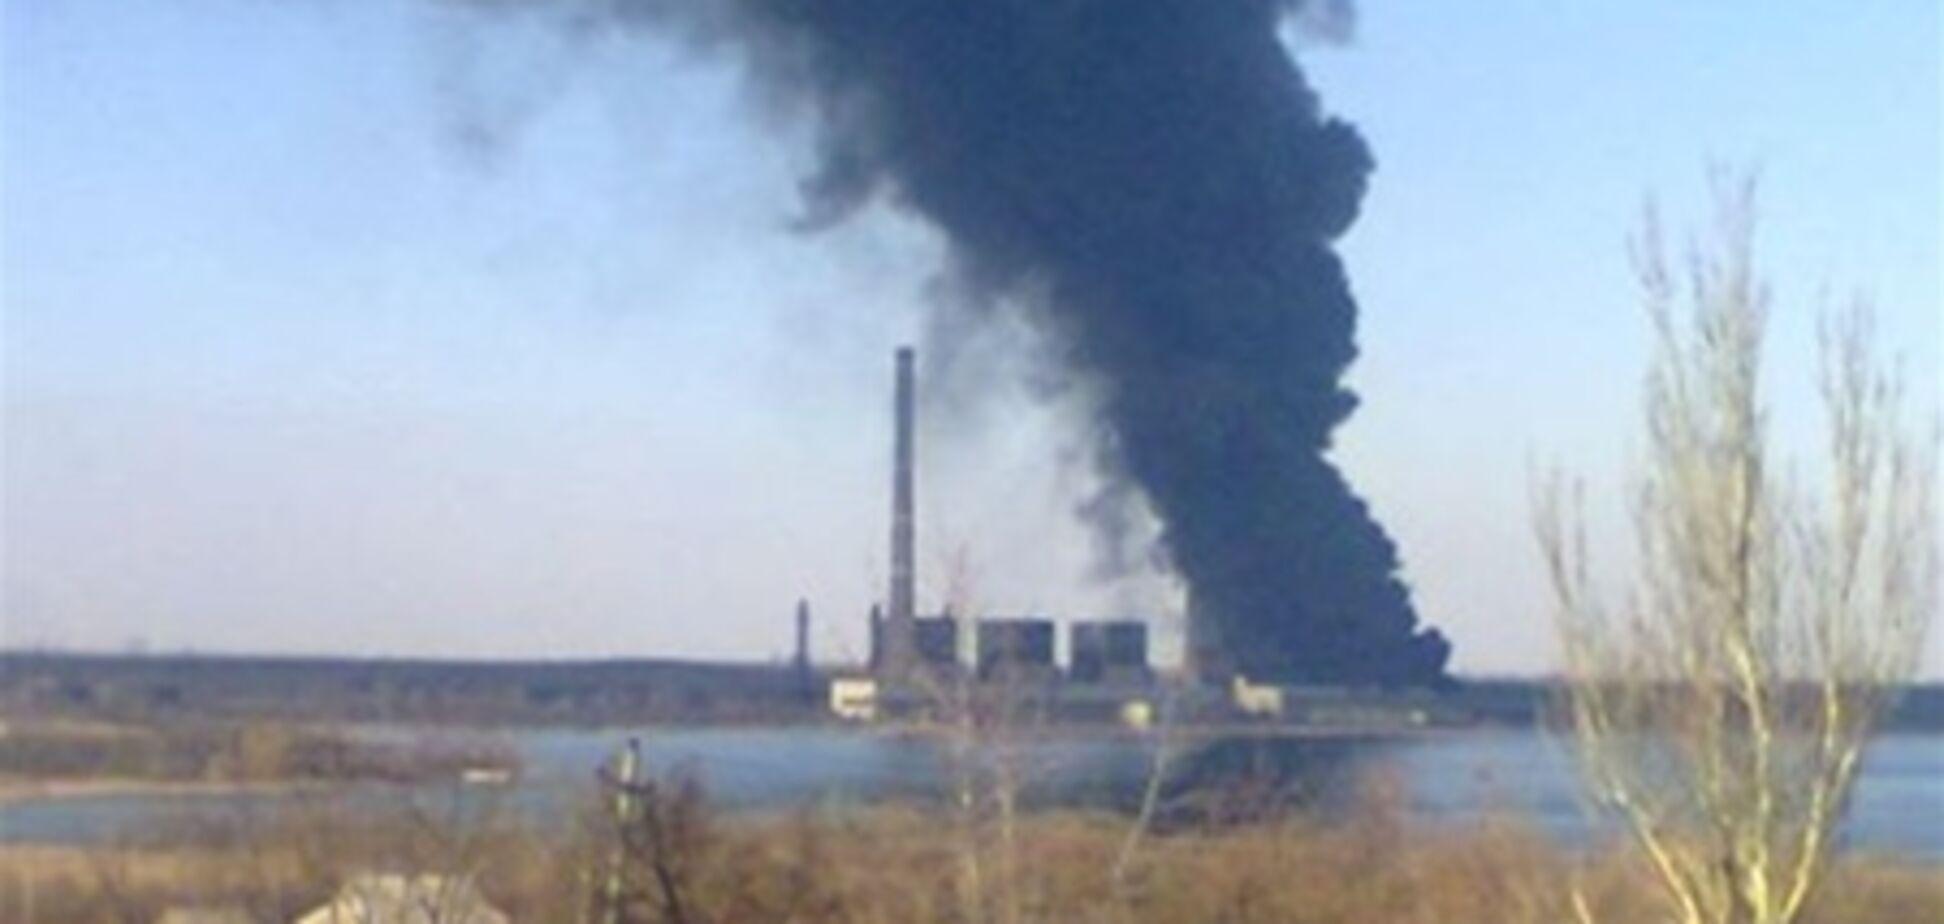 Горит Углегорская ТЭС. Фото. Видео